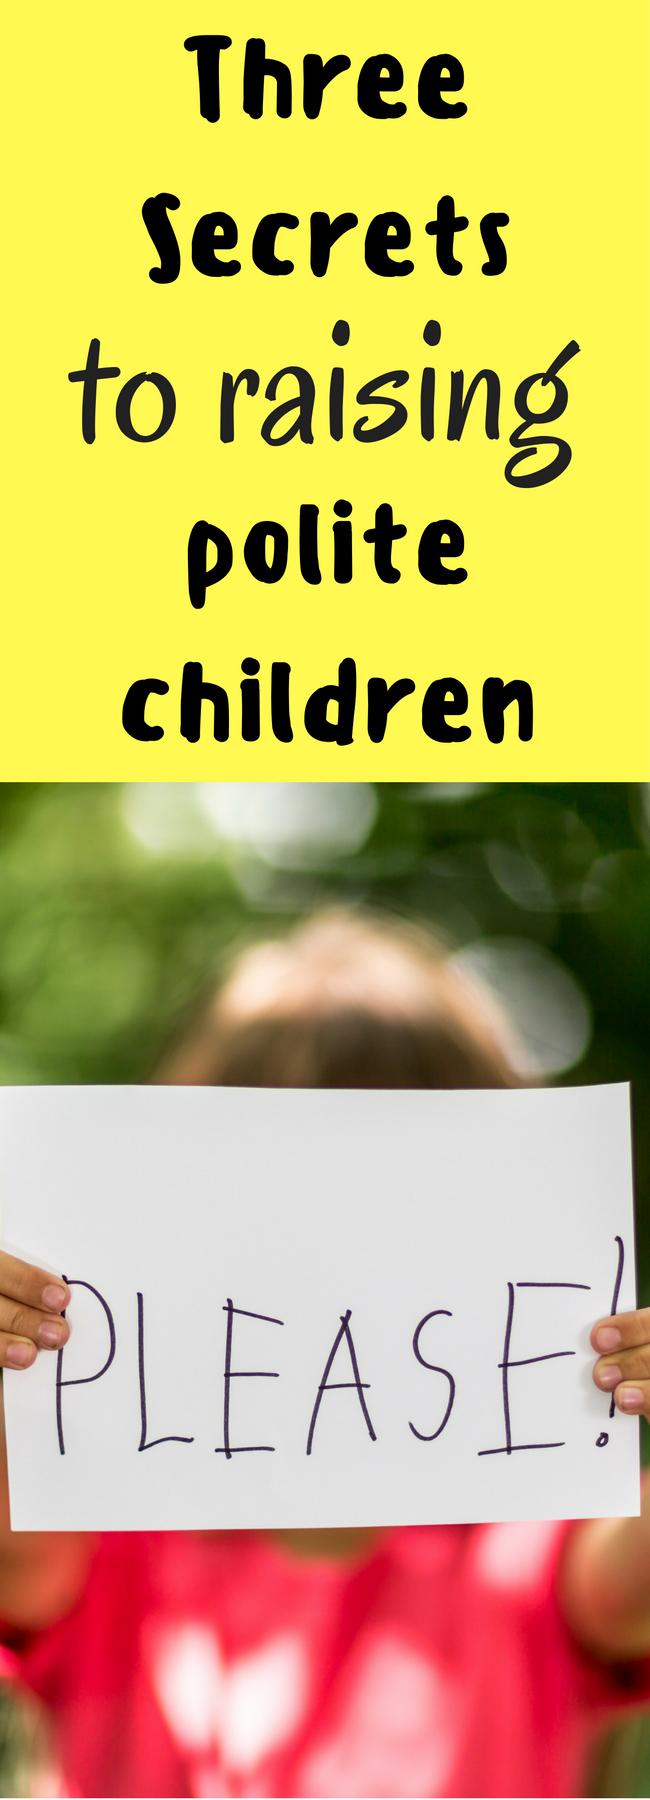 Manners for Kids / Social Skills / How to Raise Polite Children / Parenting Tips for Toddlers / Discipline / For Boys / For Girls